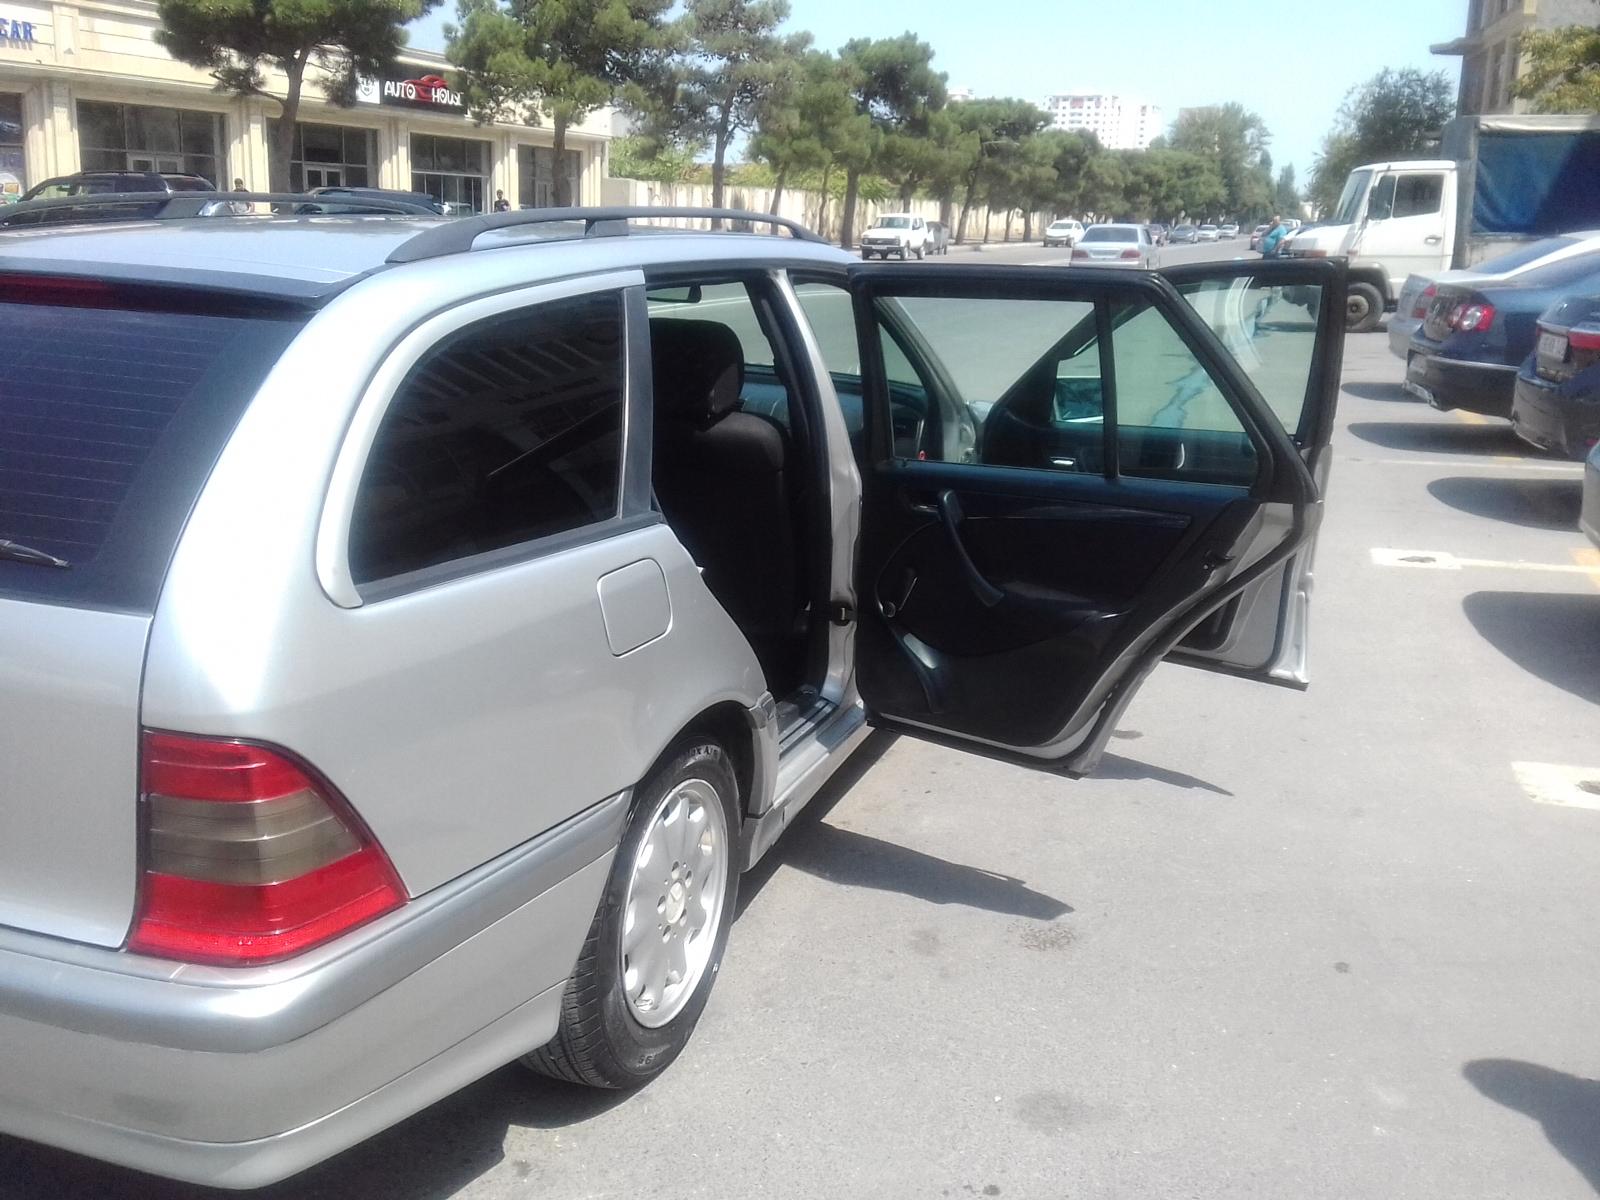 Mercedes-Benz C 180 1.8(lt) 1998 İkinci əl  $6180